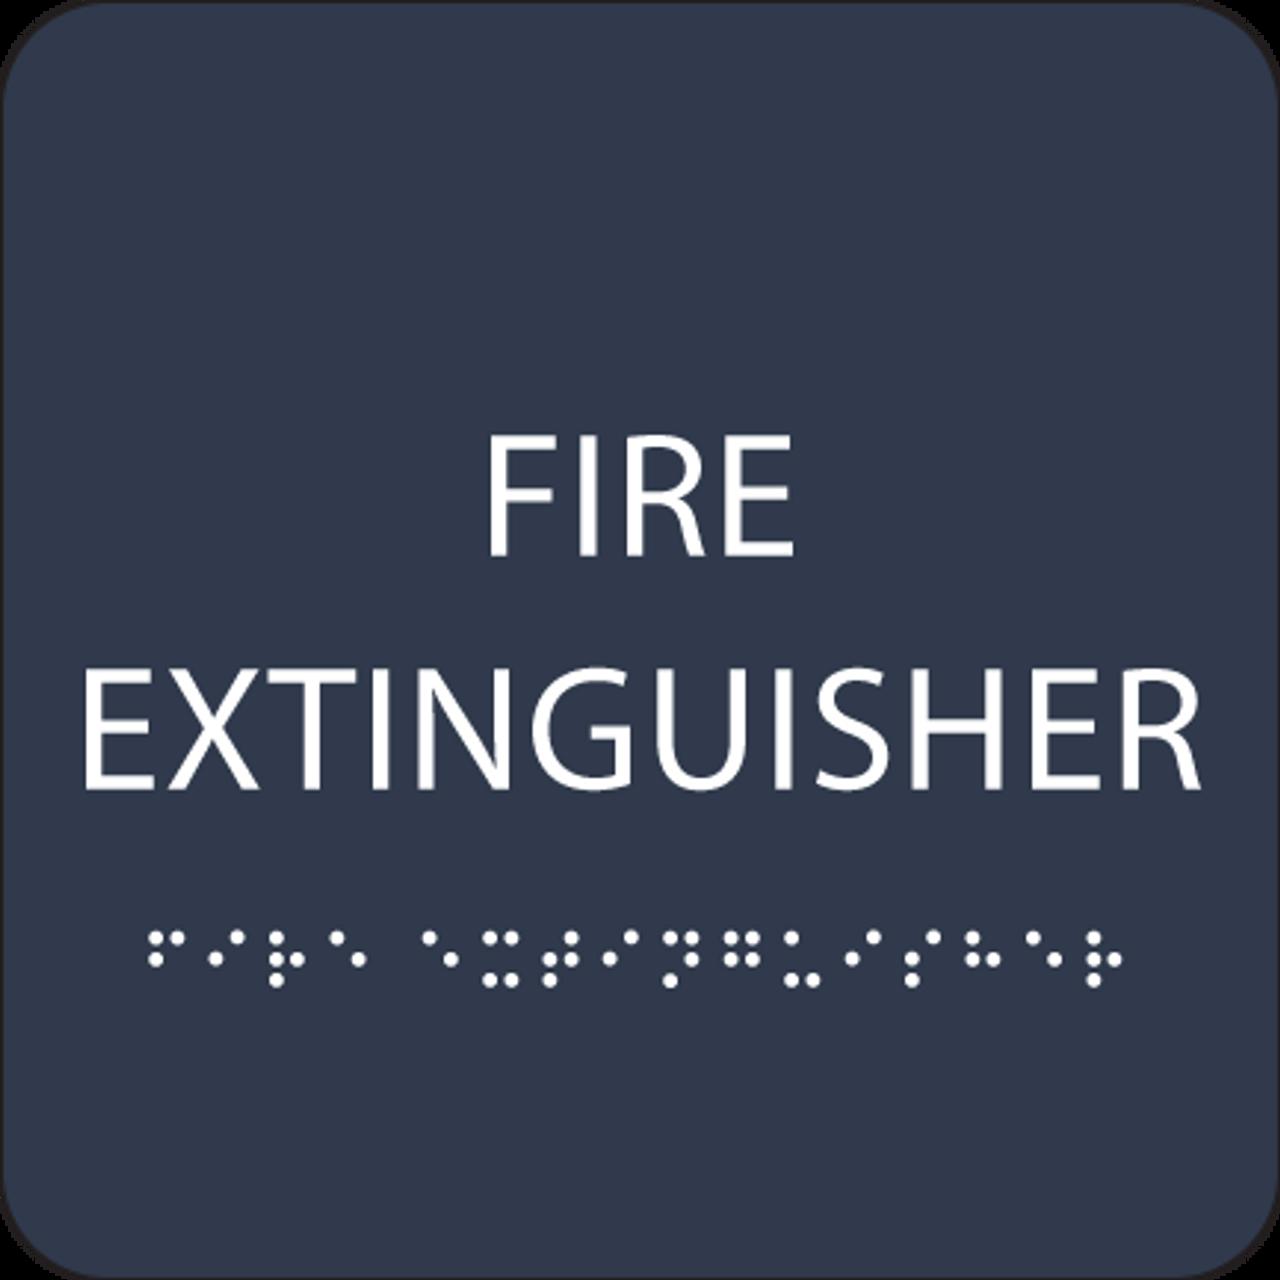 Navy Fire Extinguisher ADA Sign